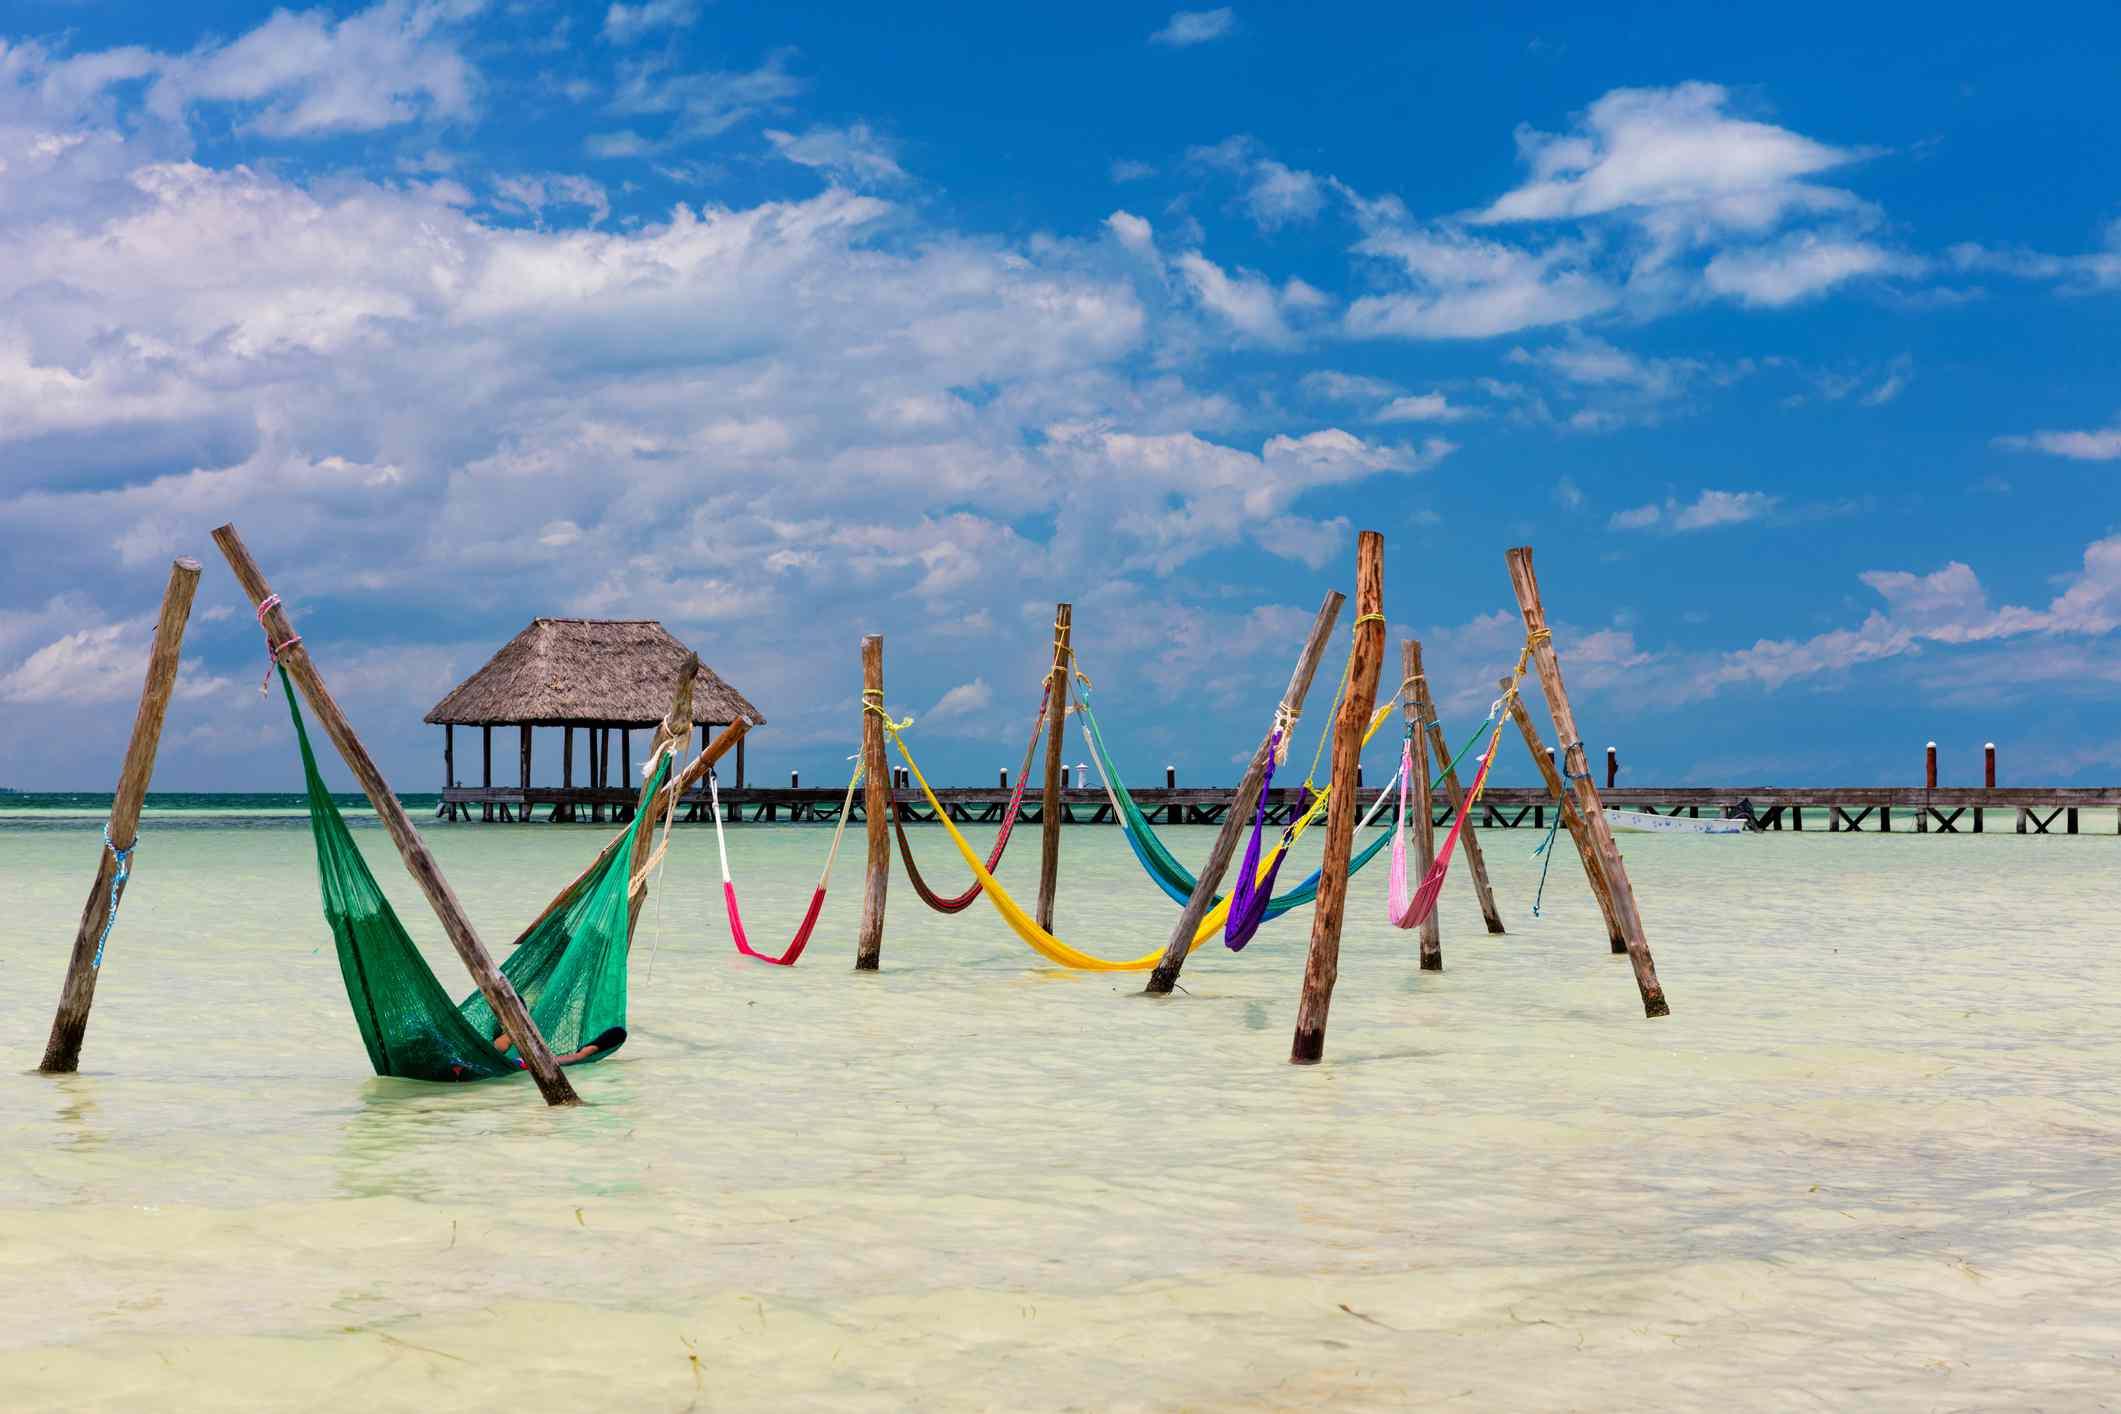 Hammocks in the water at Punta Cocos, Isla Holbox